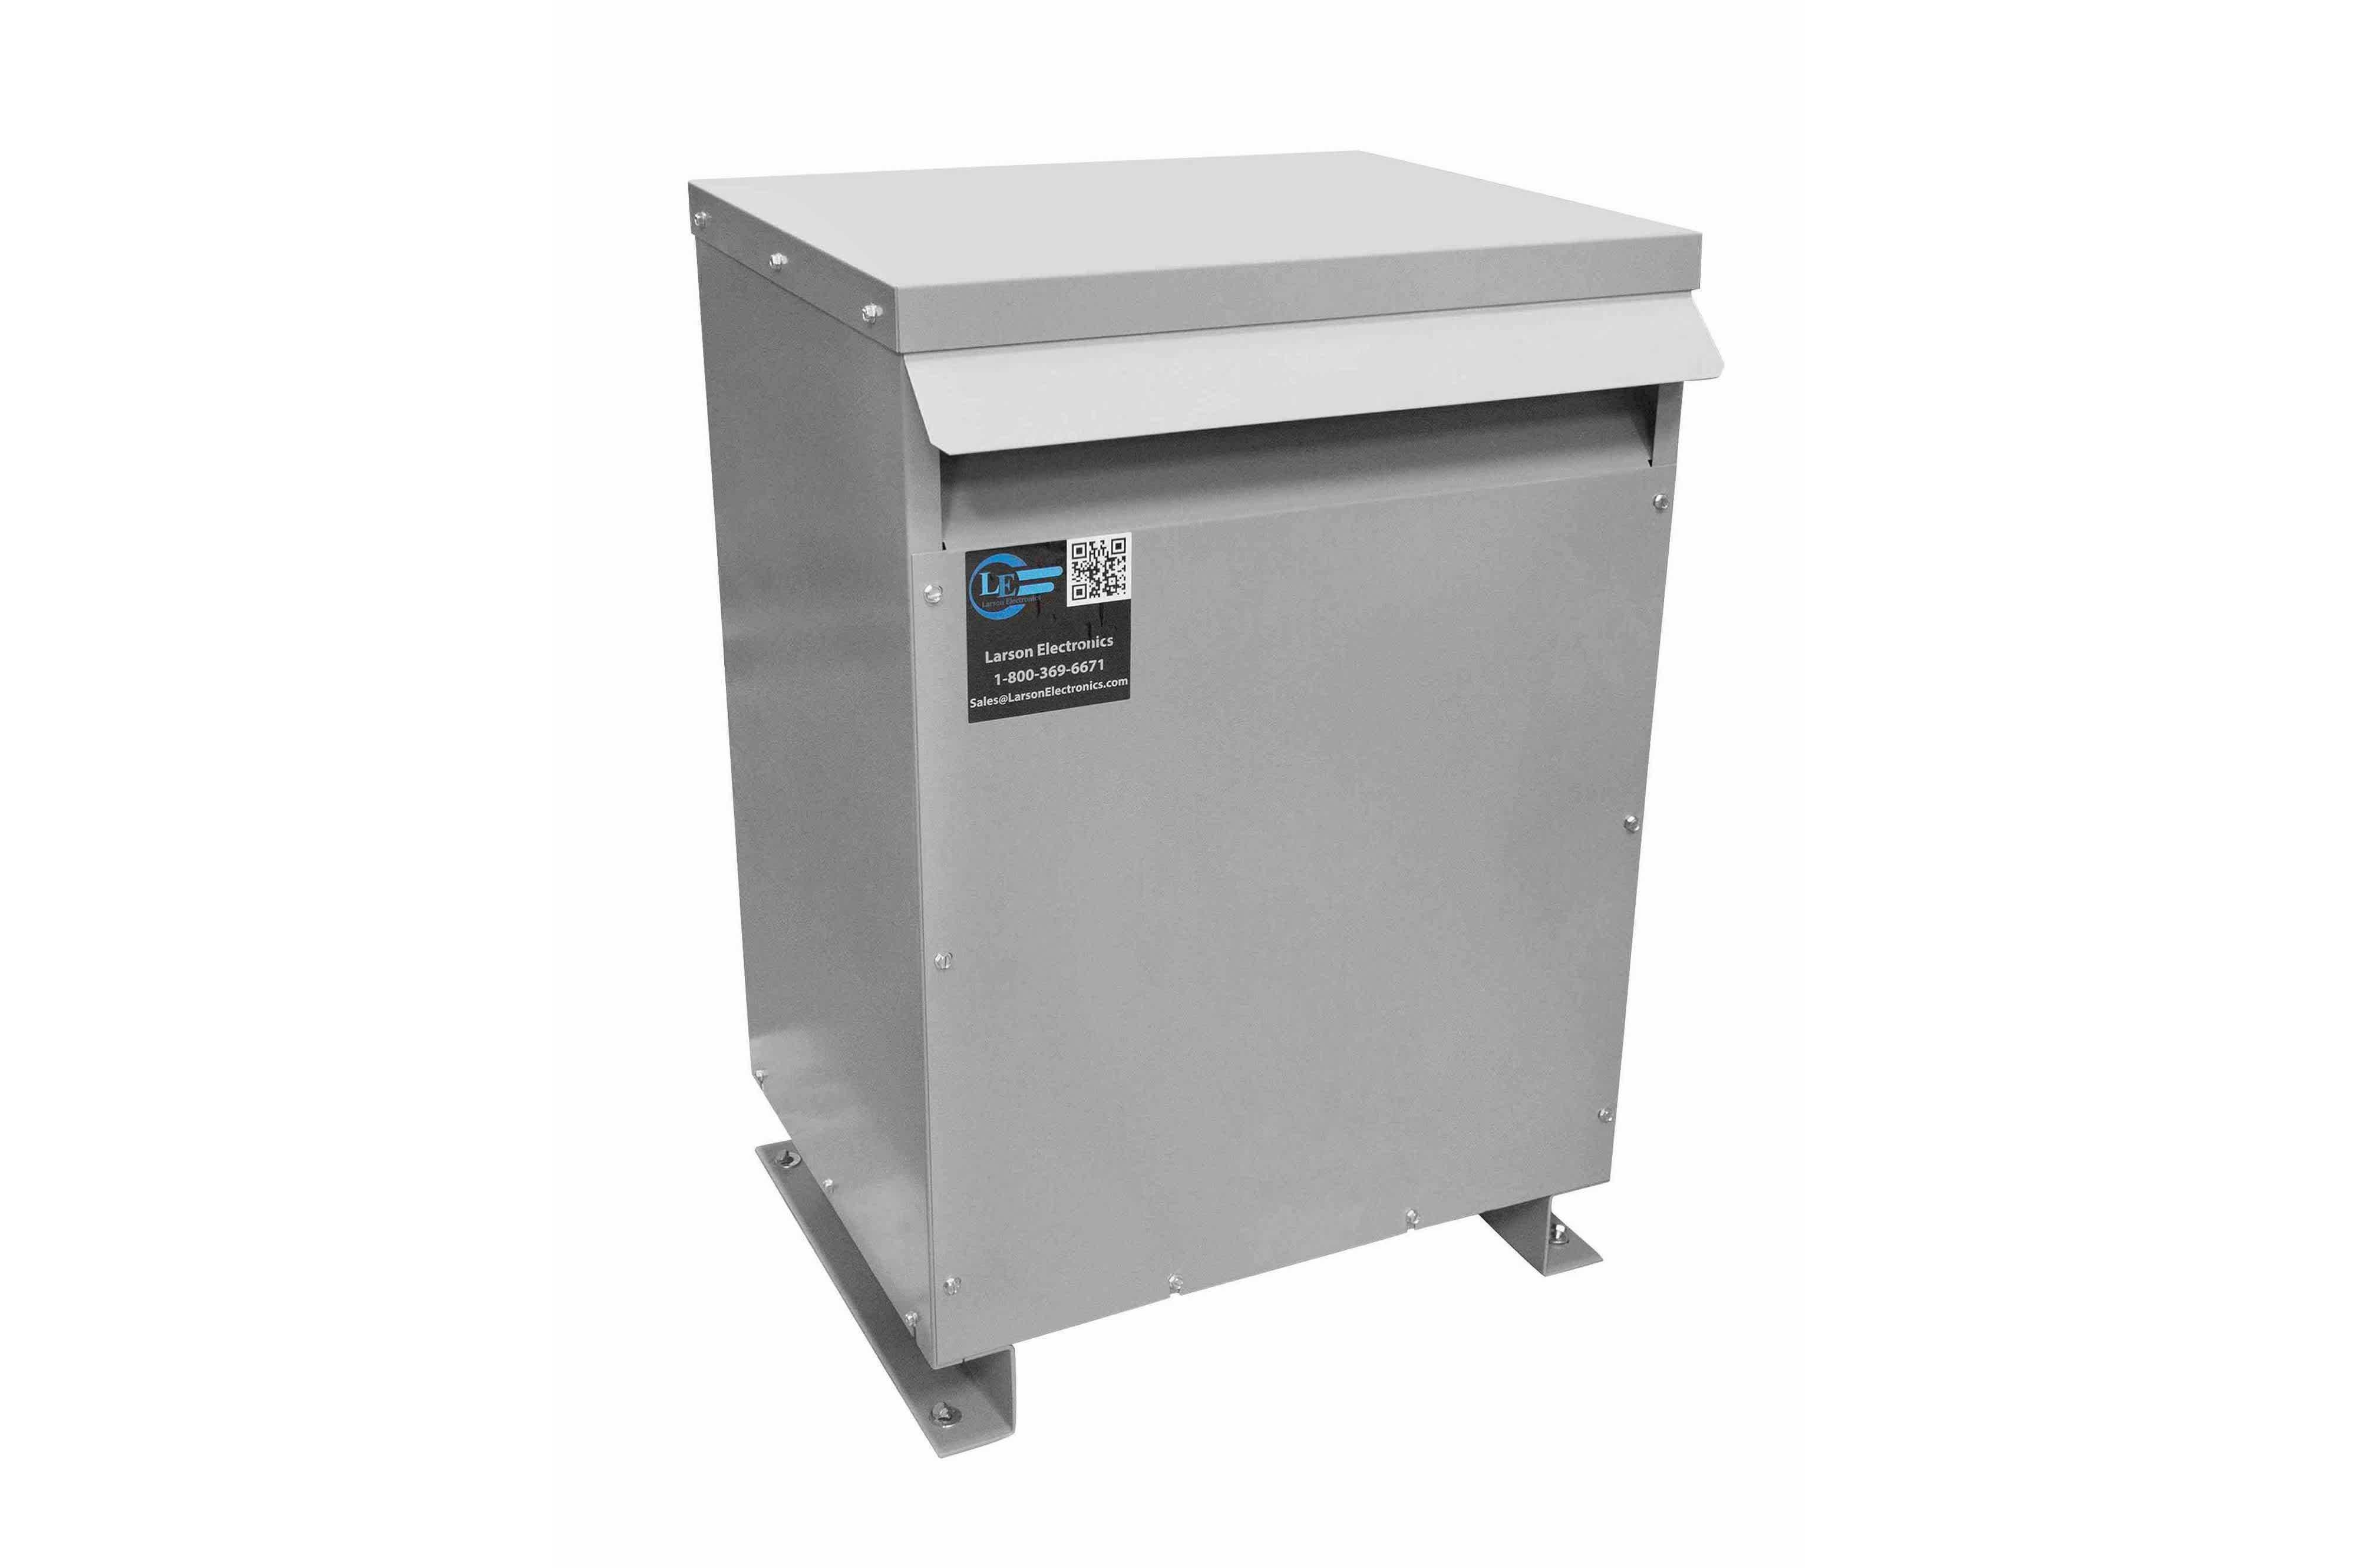 55 kVA 3PH Isolation Transformer, 440V Wye Primary, 208Y/120 Wye-N Secondary, N3R, Ventilated, 60 Hz